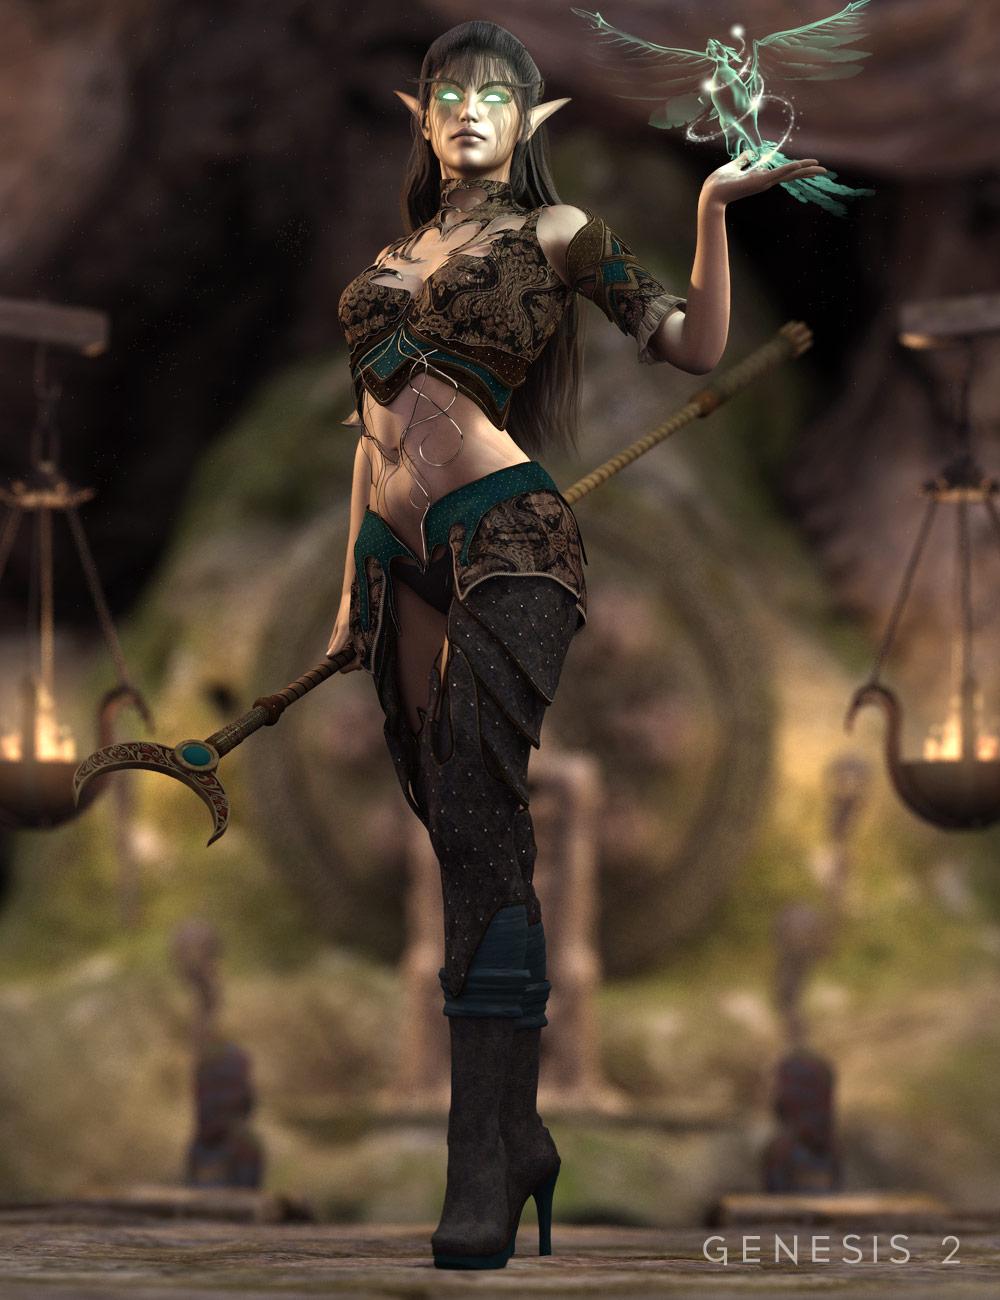 Dark Elf Enchantress Outfit for Genesis 2 Female(s) by: Barbara BrundonSarsa, 3D Models by Daz 3D